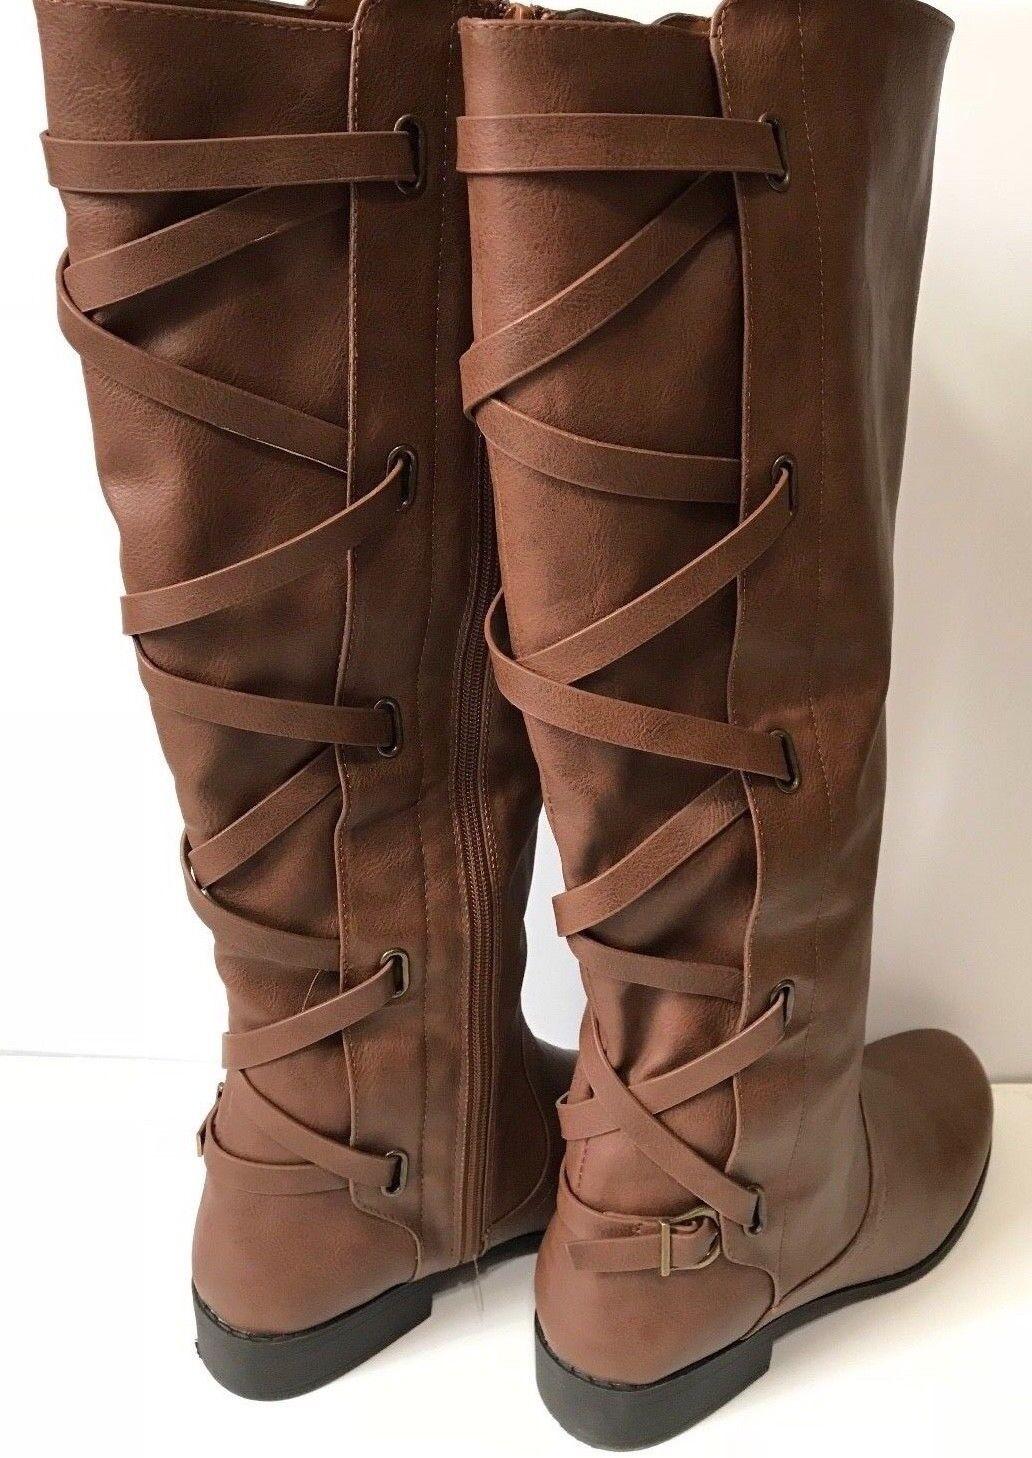 New Women  Cognac Brown Black Buckle Riding Knee High Cowboy Boots 9.5